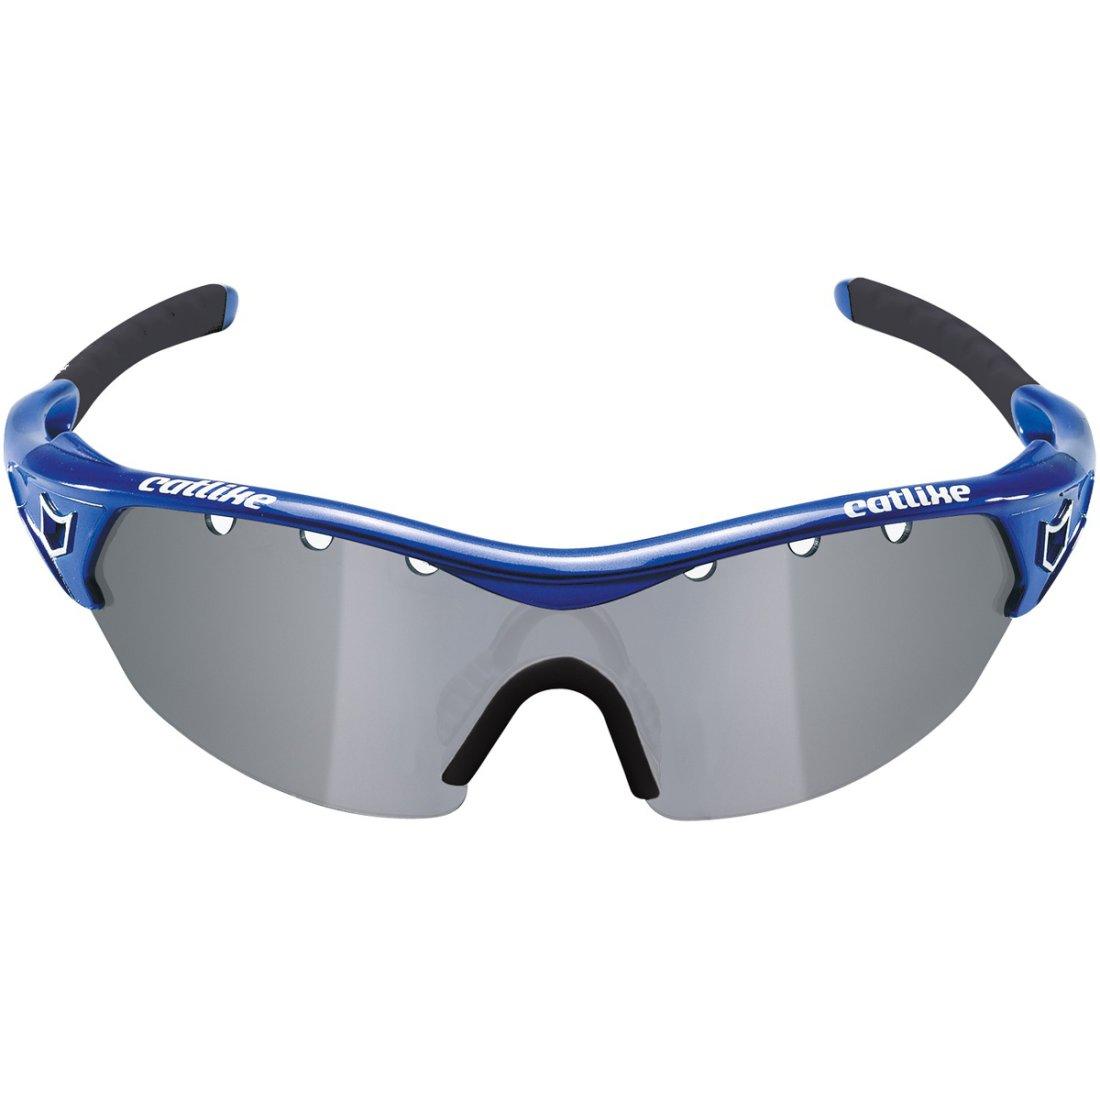 1b9e1f29ae CATLIKE Storm PH Blue Mask   Goggle · Motocard